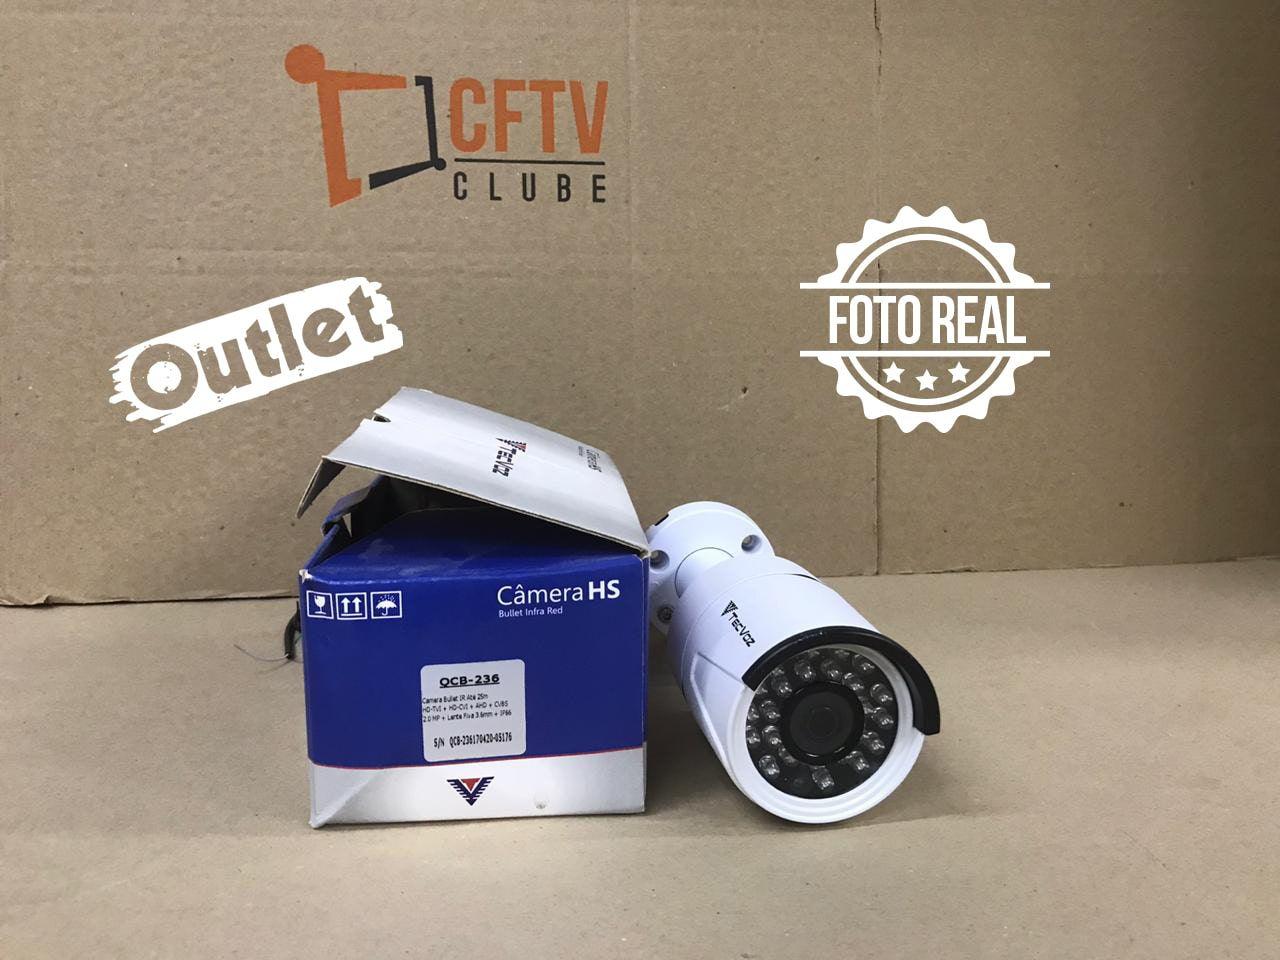 Outlet - Câmera Tecvoz Bullet Flex HD QCB-236 Full HD (2.0MP | 1080p | 3.6mm | Metal)  - CFTV Clube | Brasil